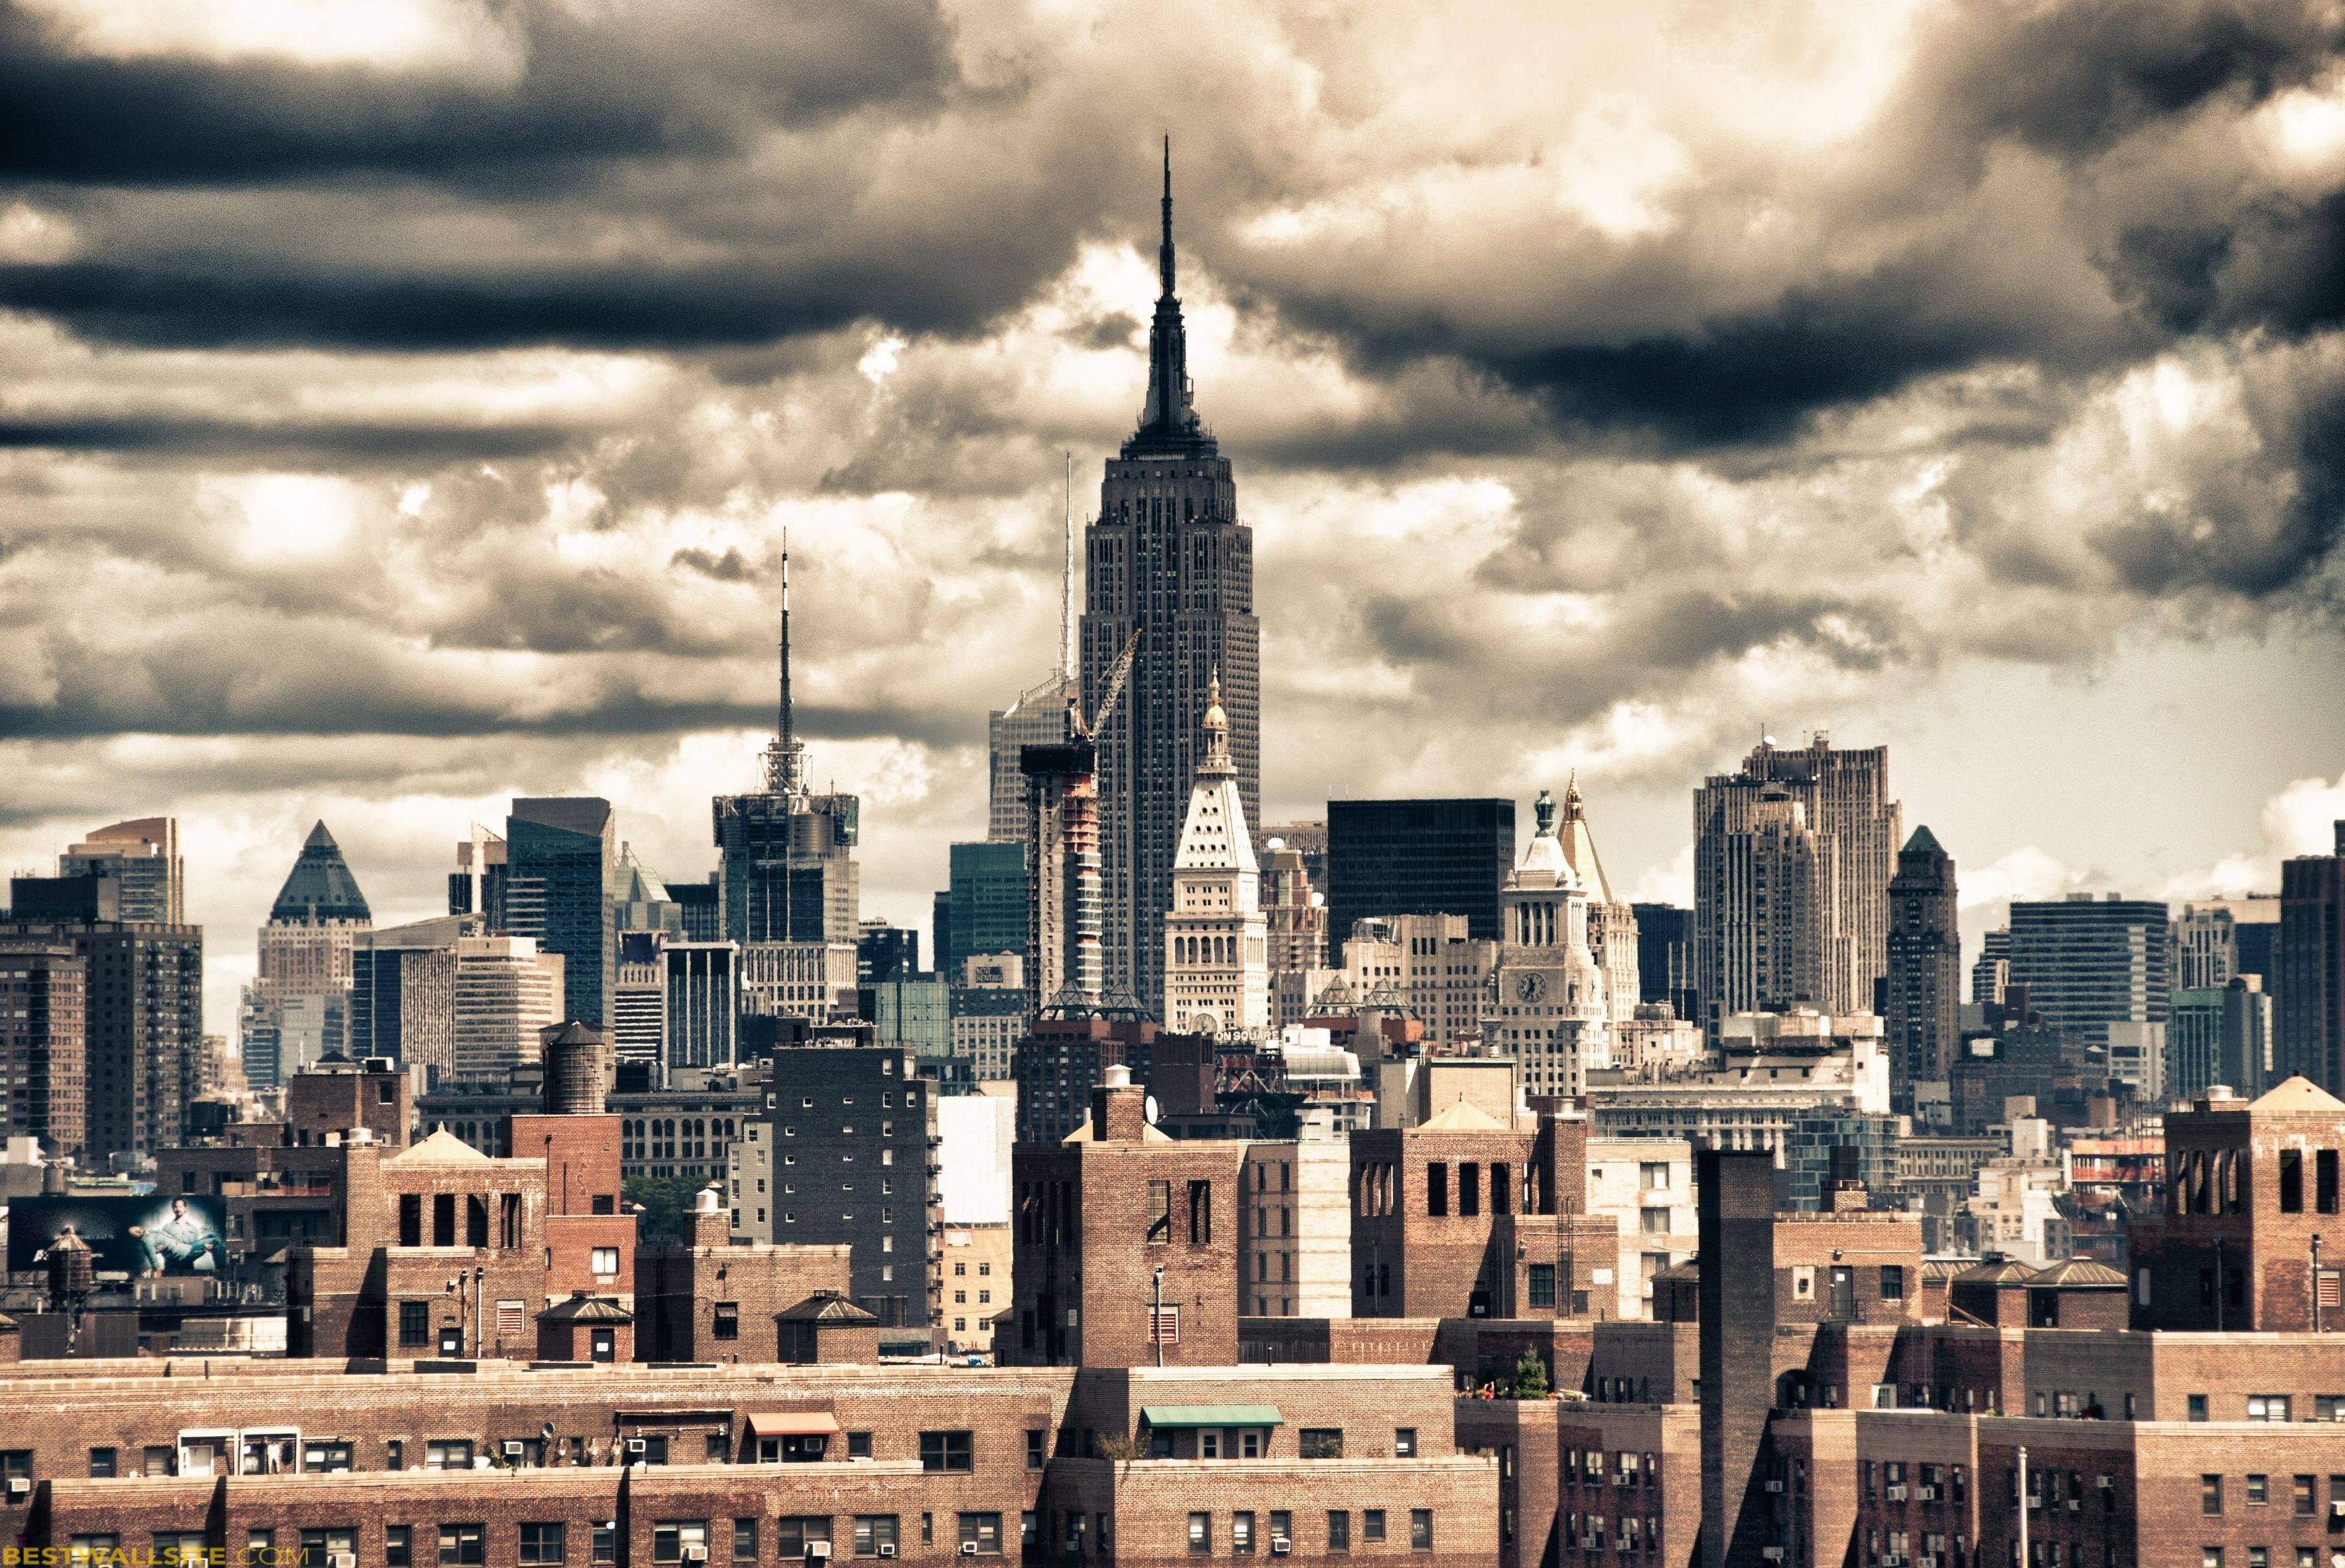 Empire State Building BestWallSitecom 3534x2363